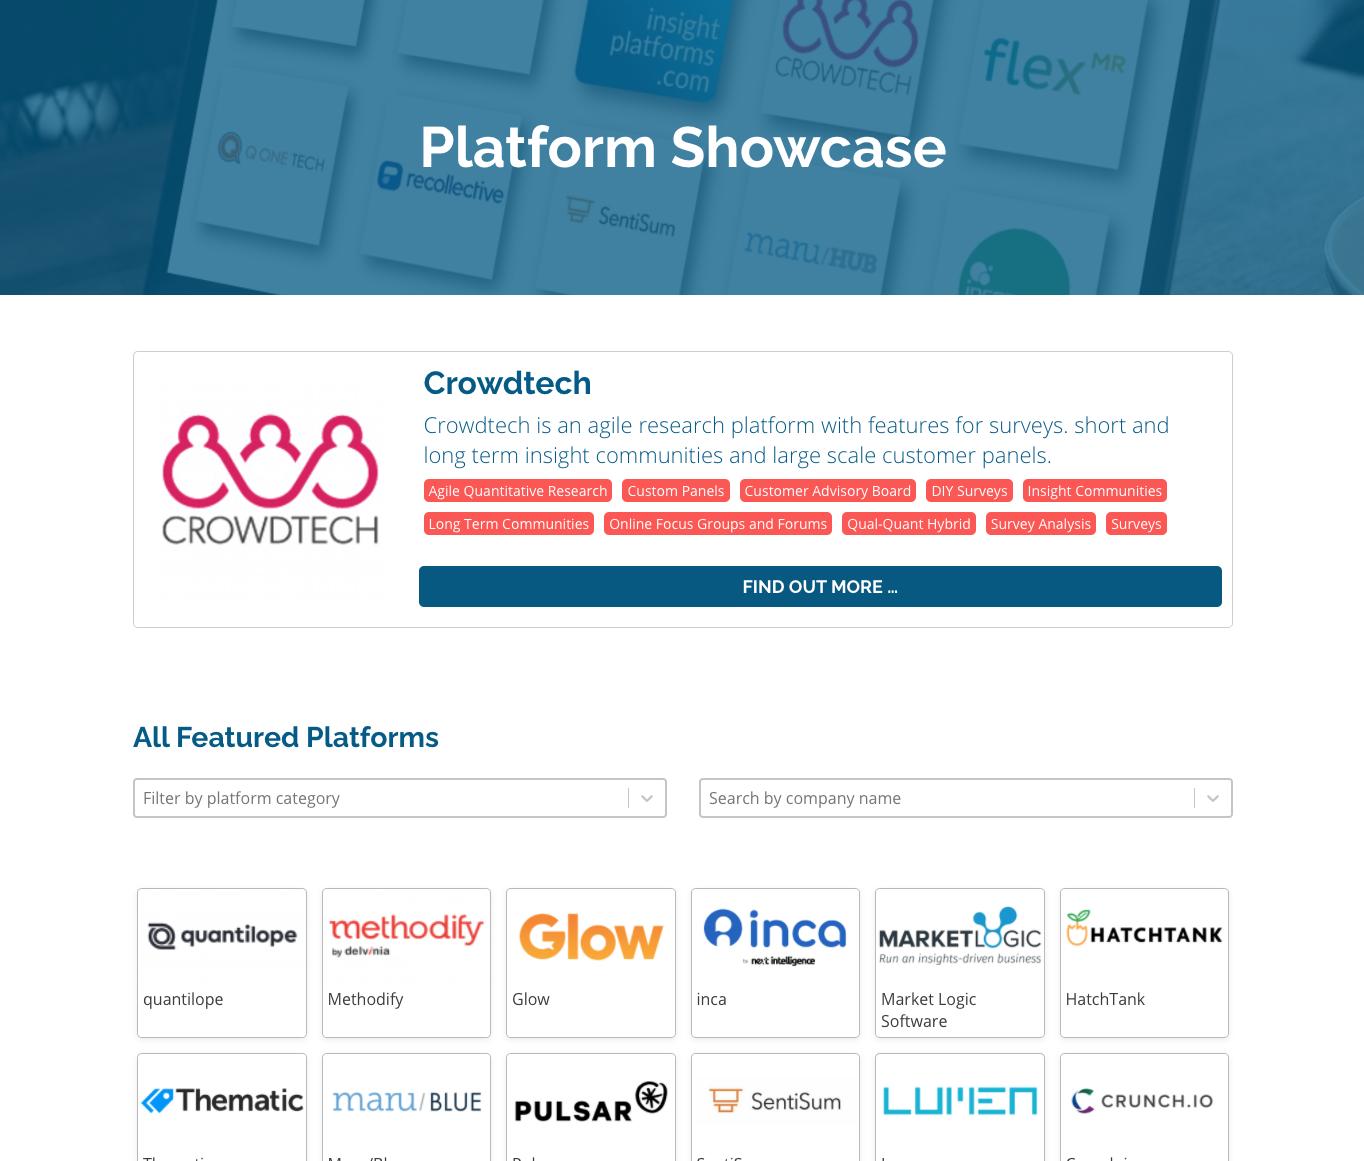 Platforms Showcase - Insight Platforms